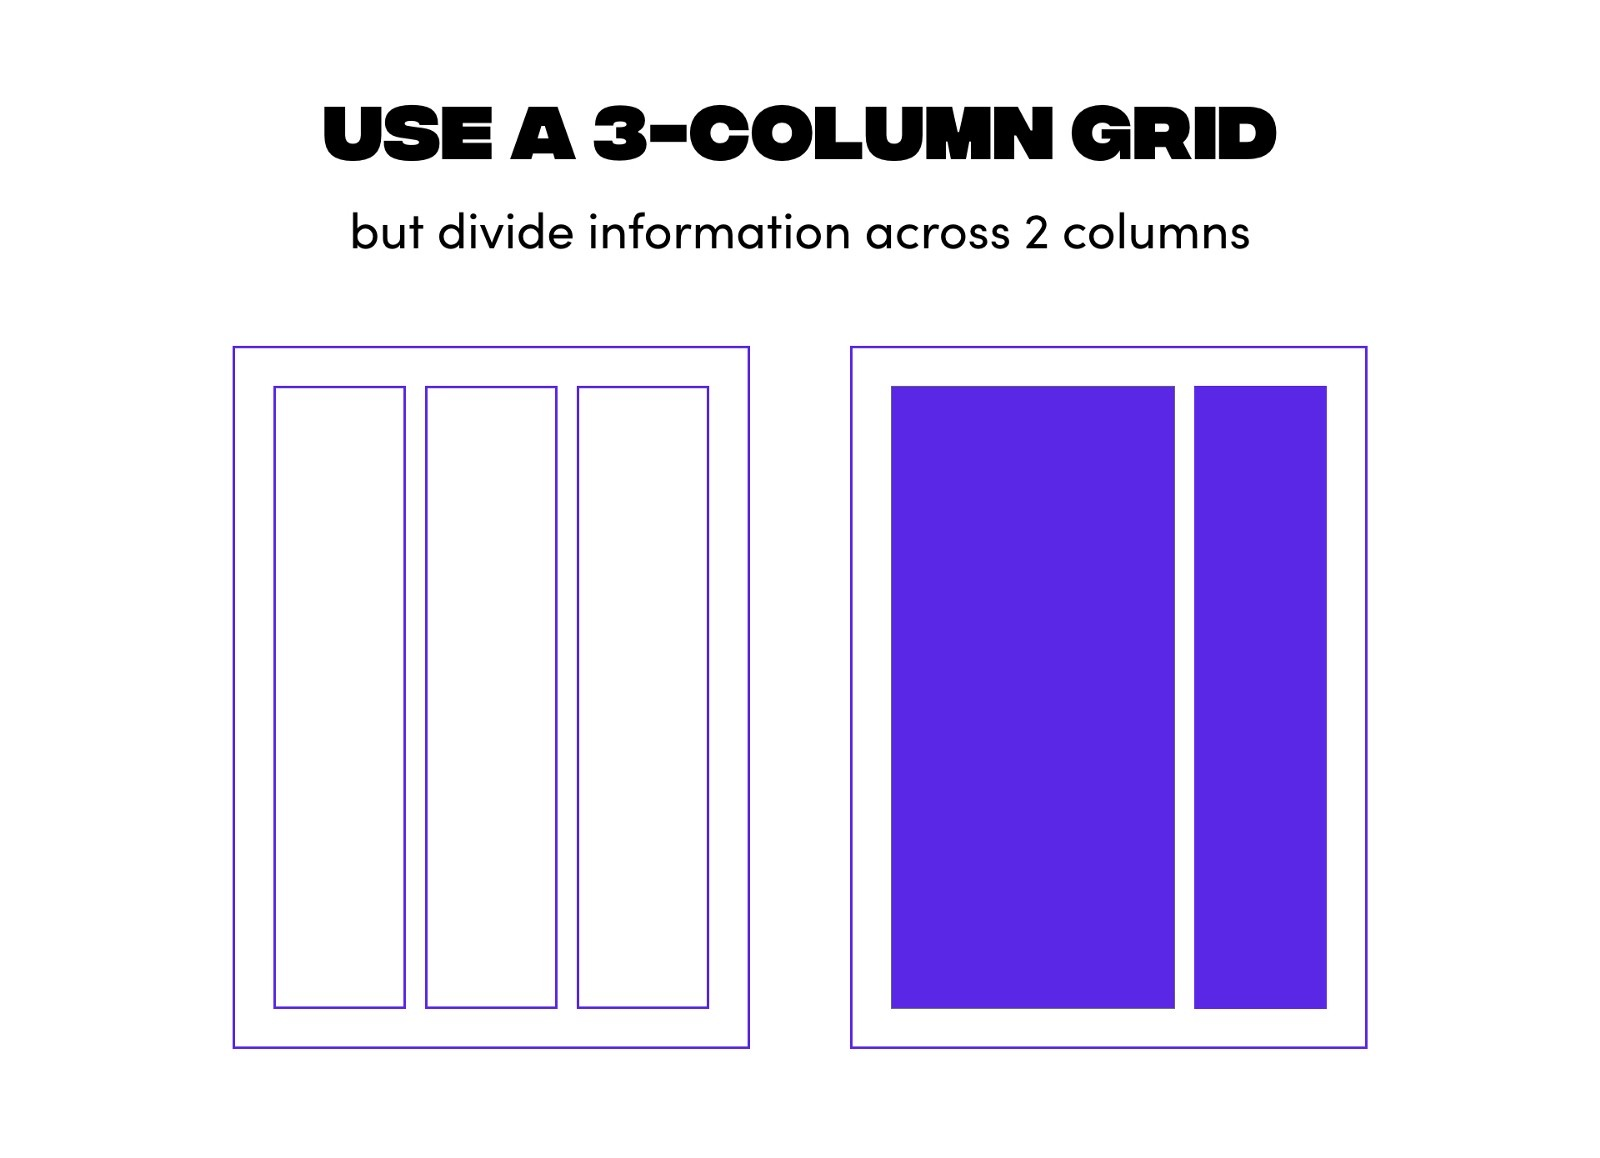 Use a 3-column grid but divide information across 2 columns